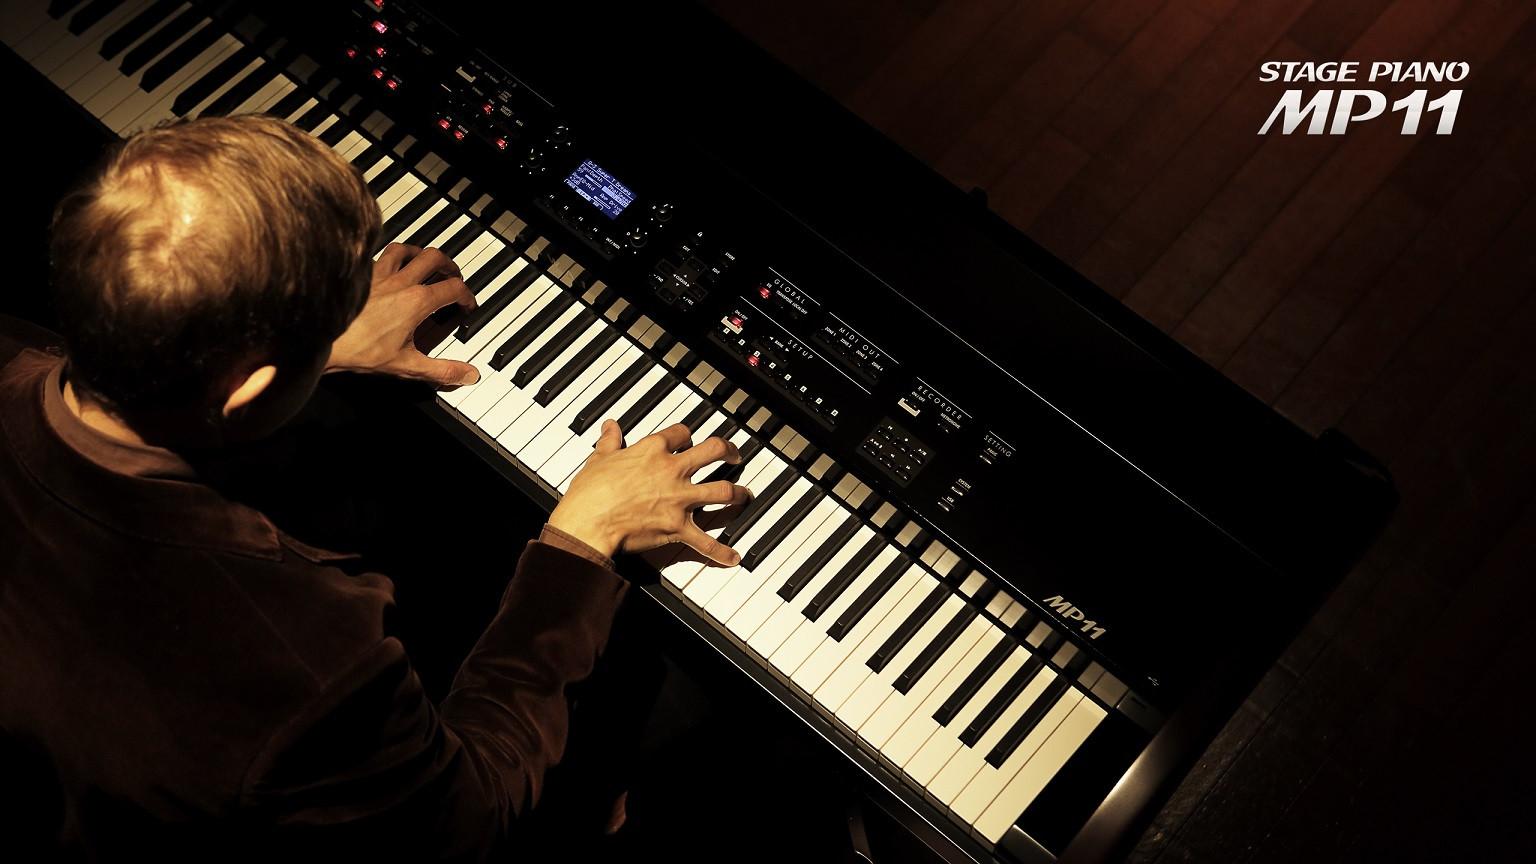 kawai mp11 stage piano piano digital teclado musifex. Black Bedroom Furniture Sets. Home Design Ideas